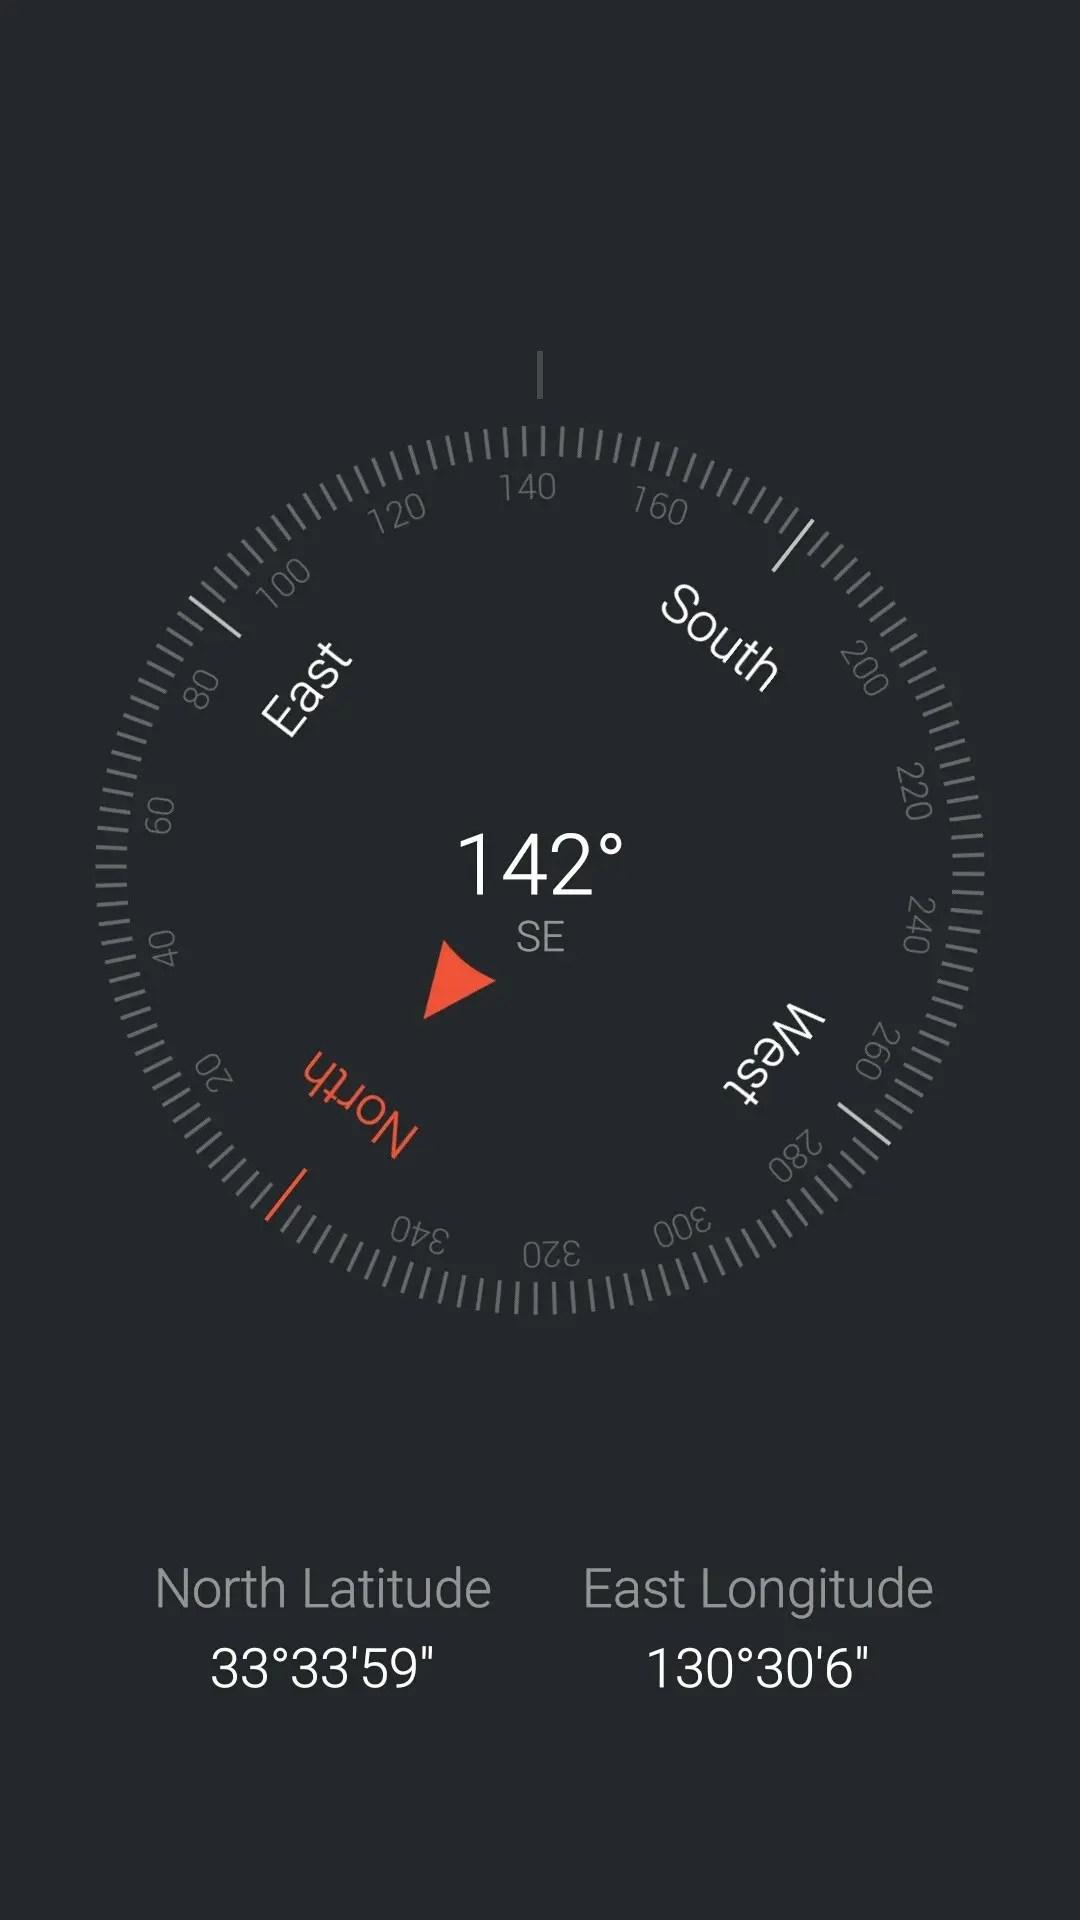 Compass コンパス(方位磁石)